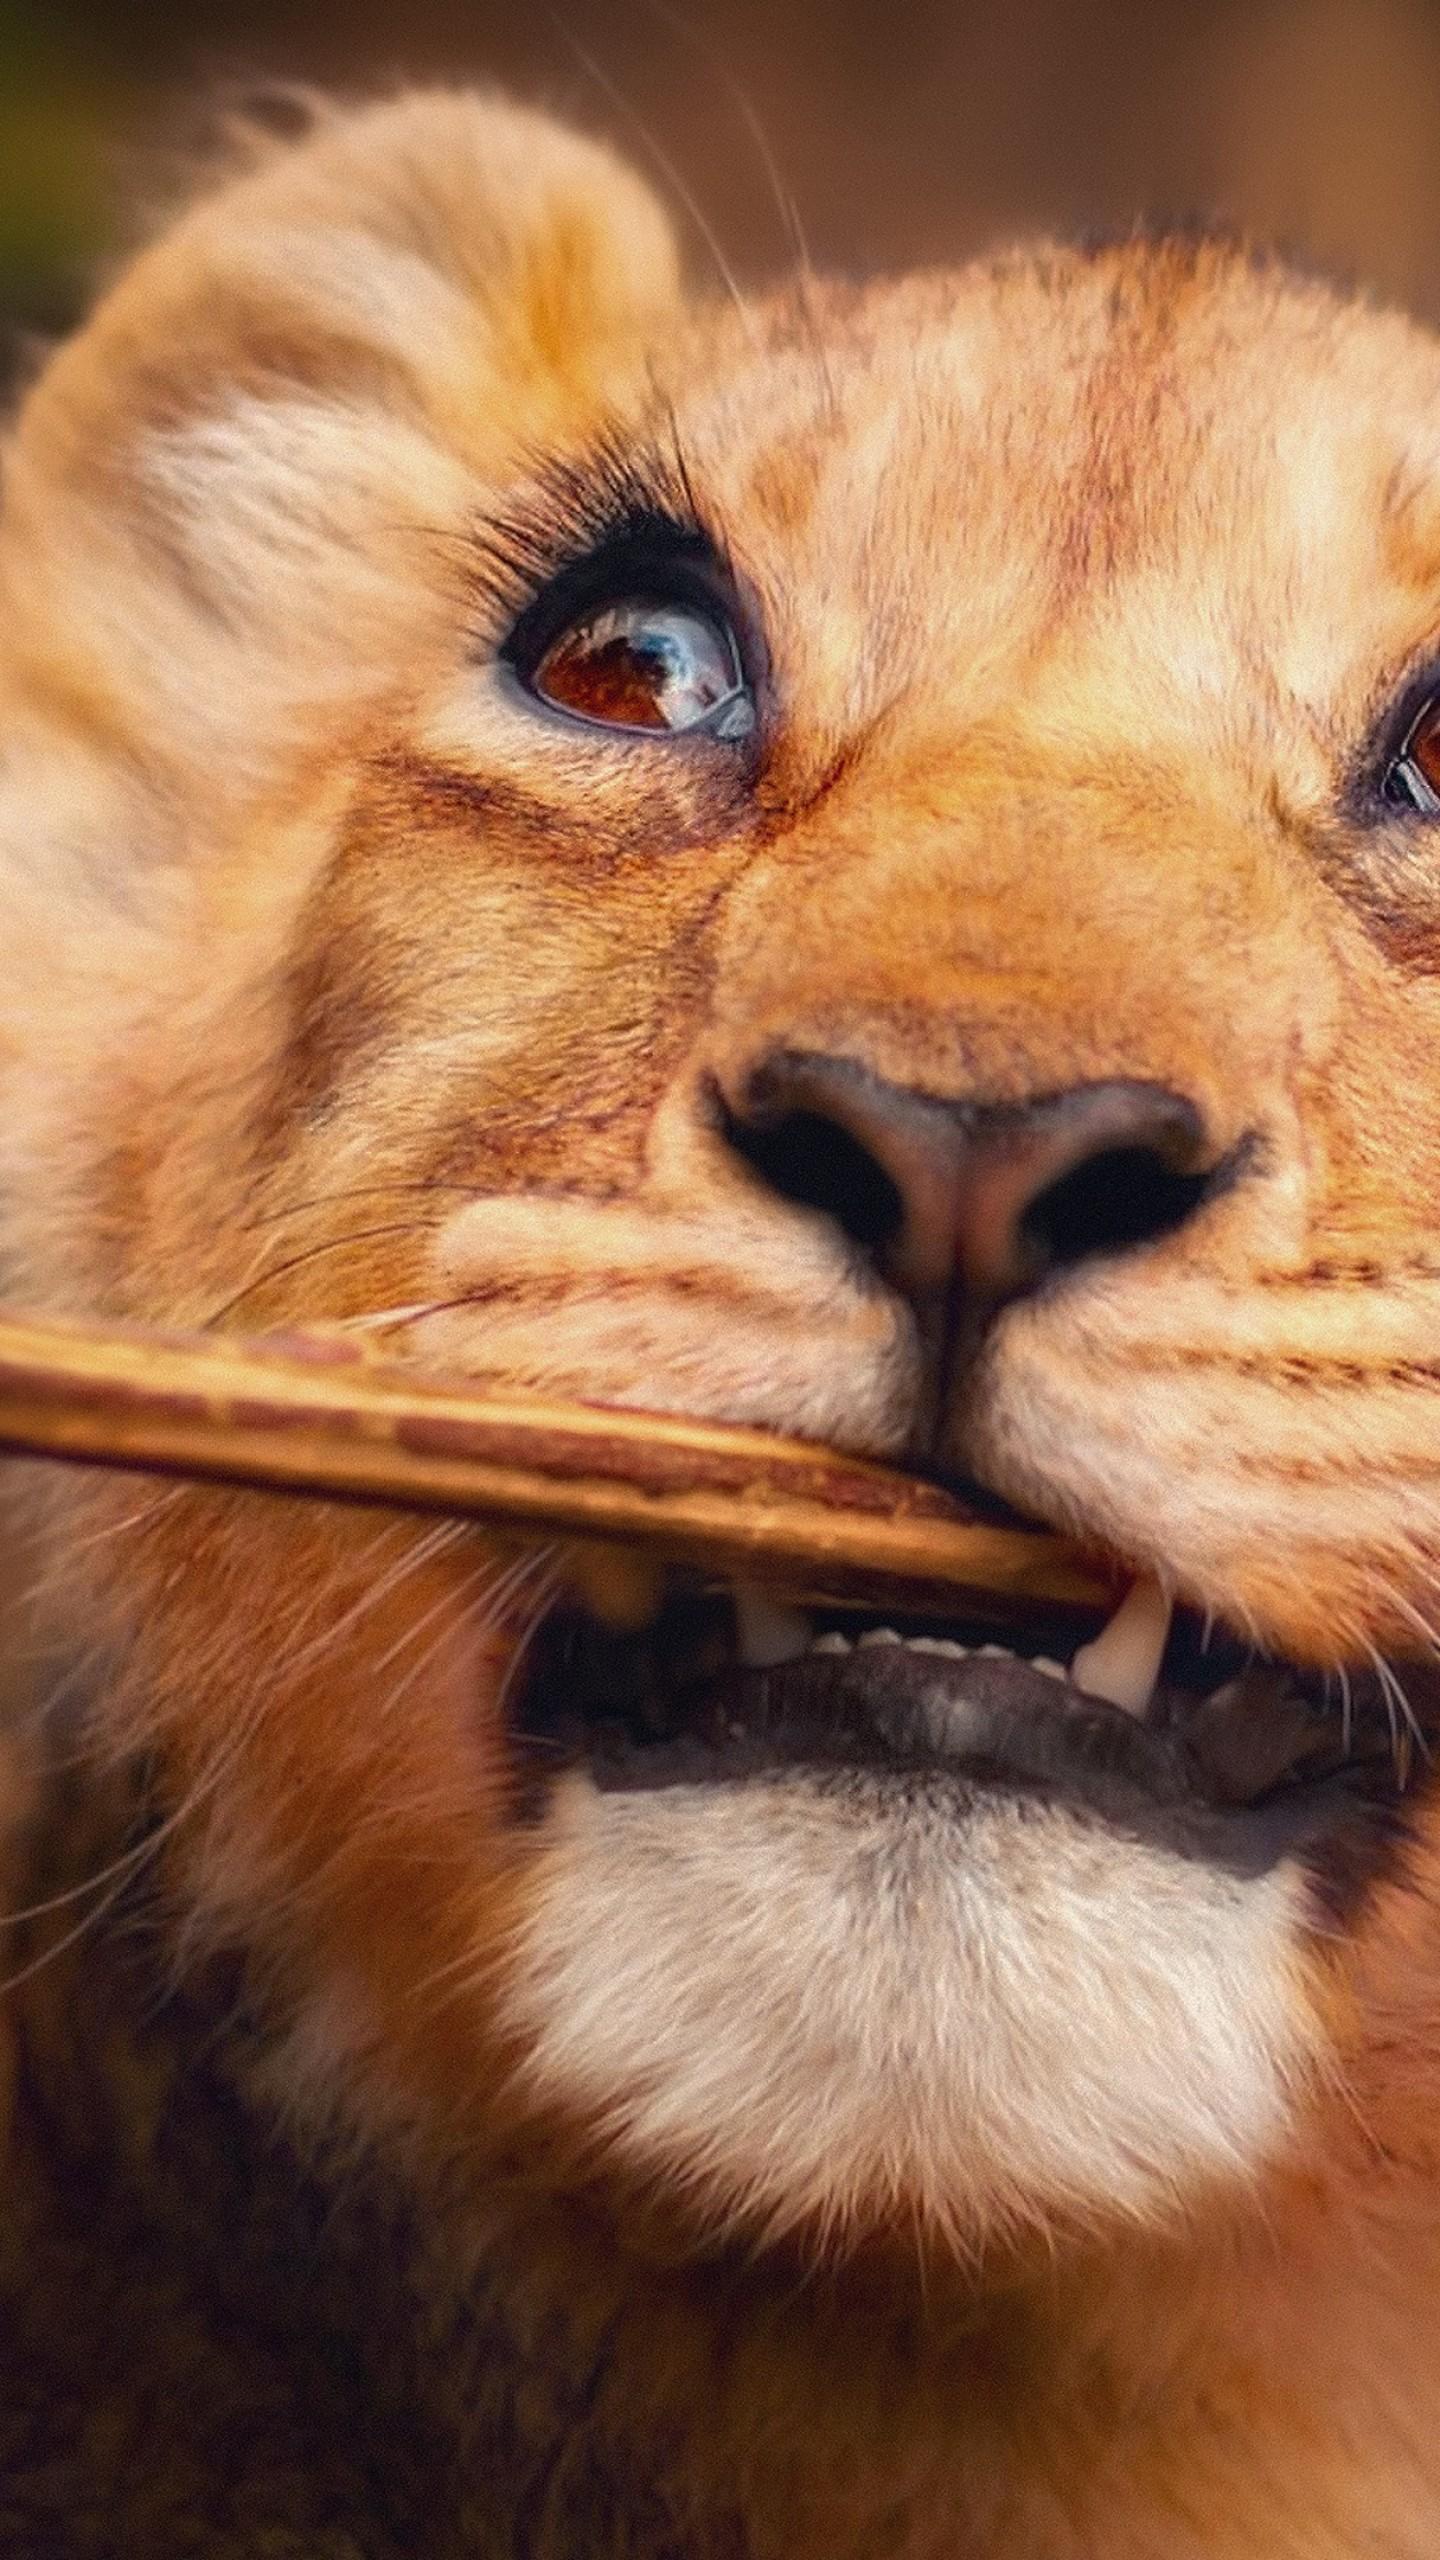 Wallpaper Lion Funny Animals 4k Animals 19407